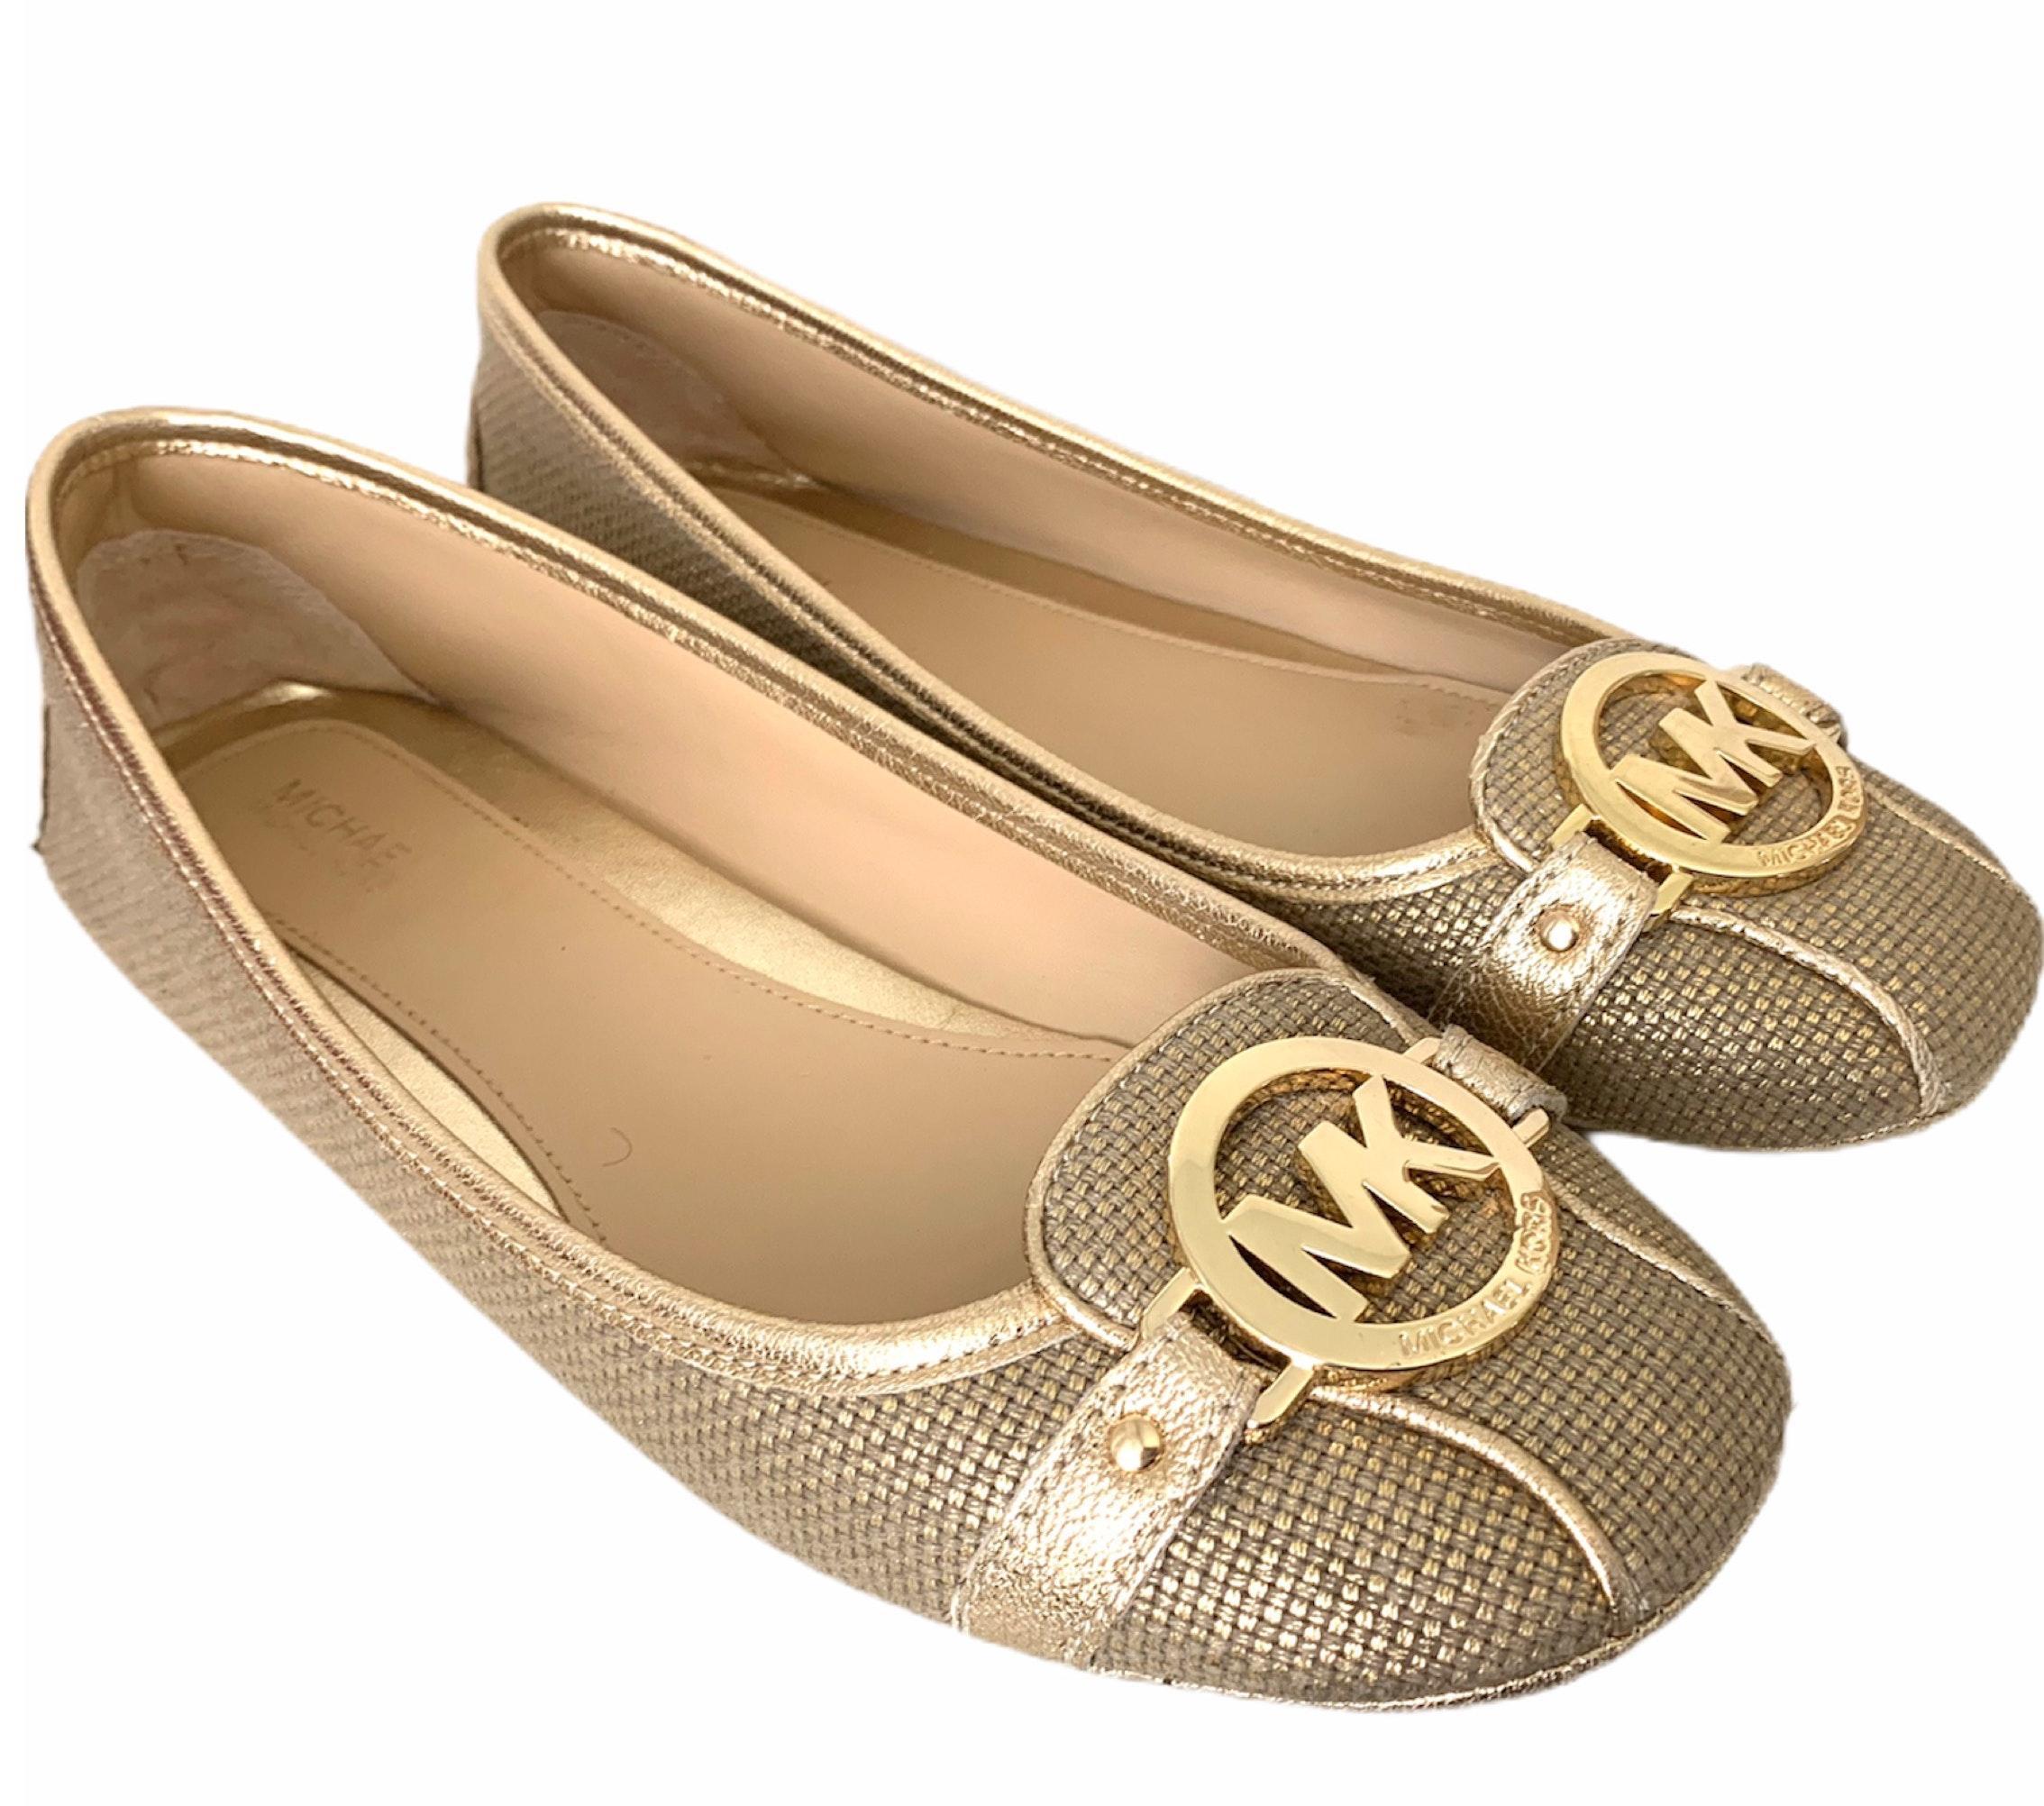 Michael Kors Fulton Gold Leather